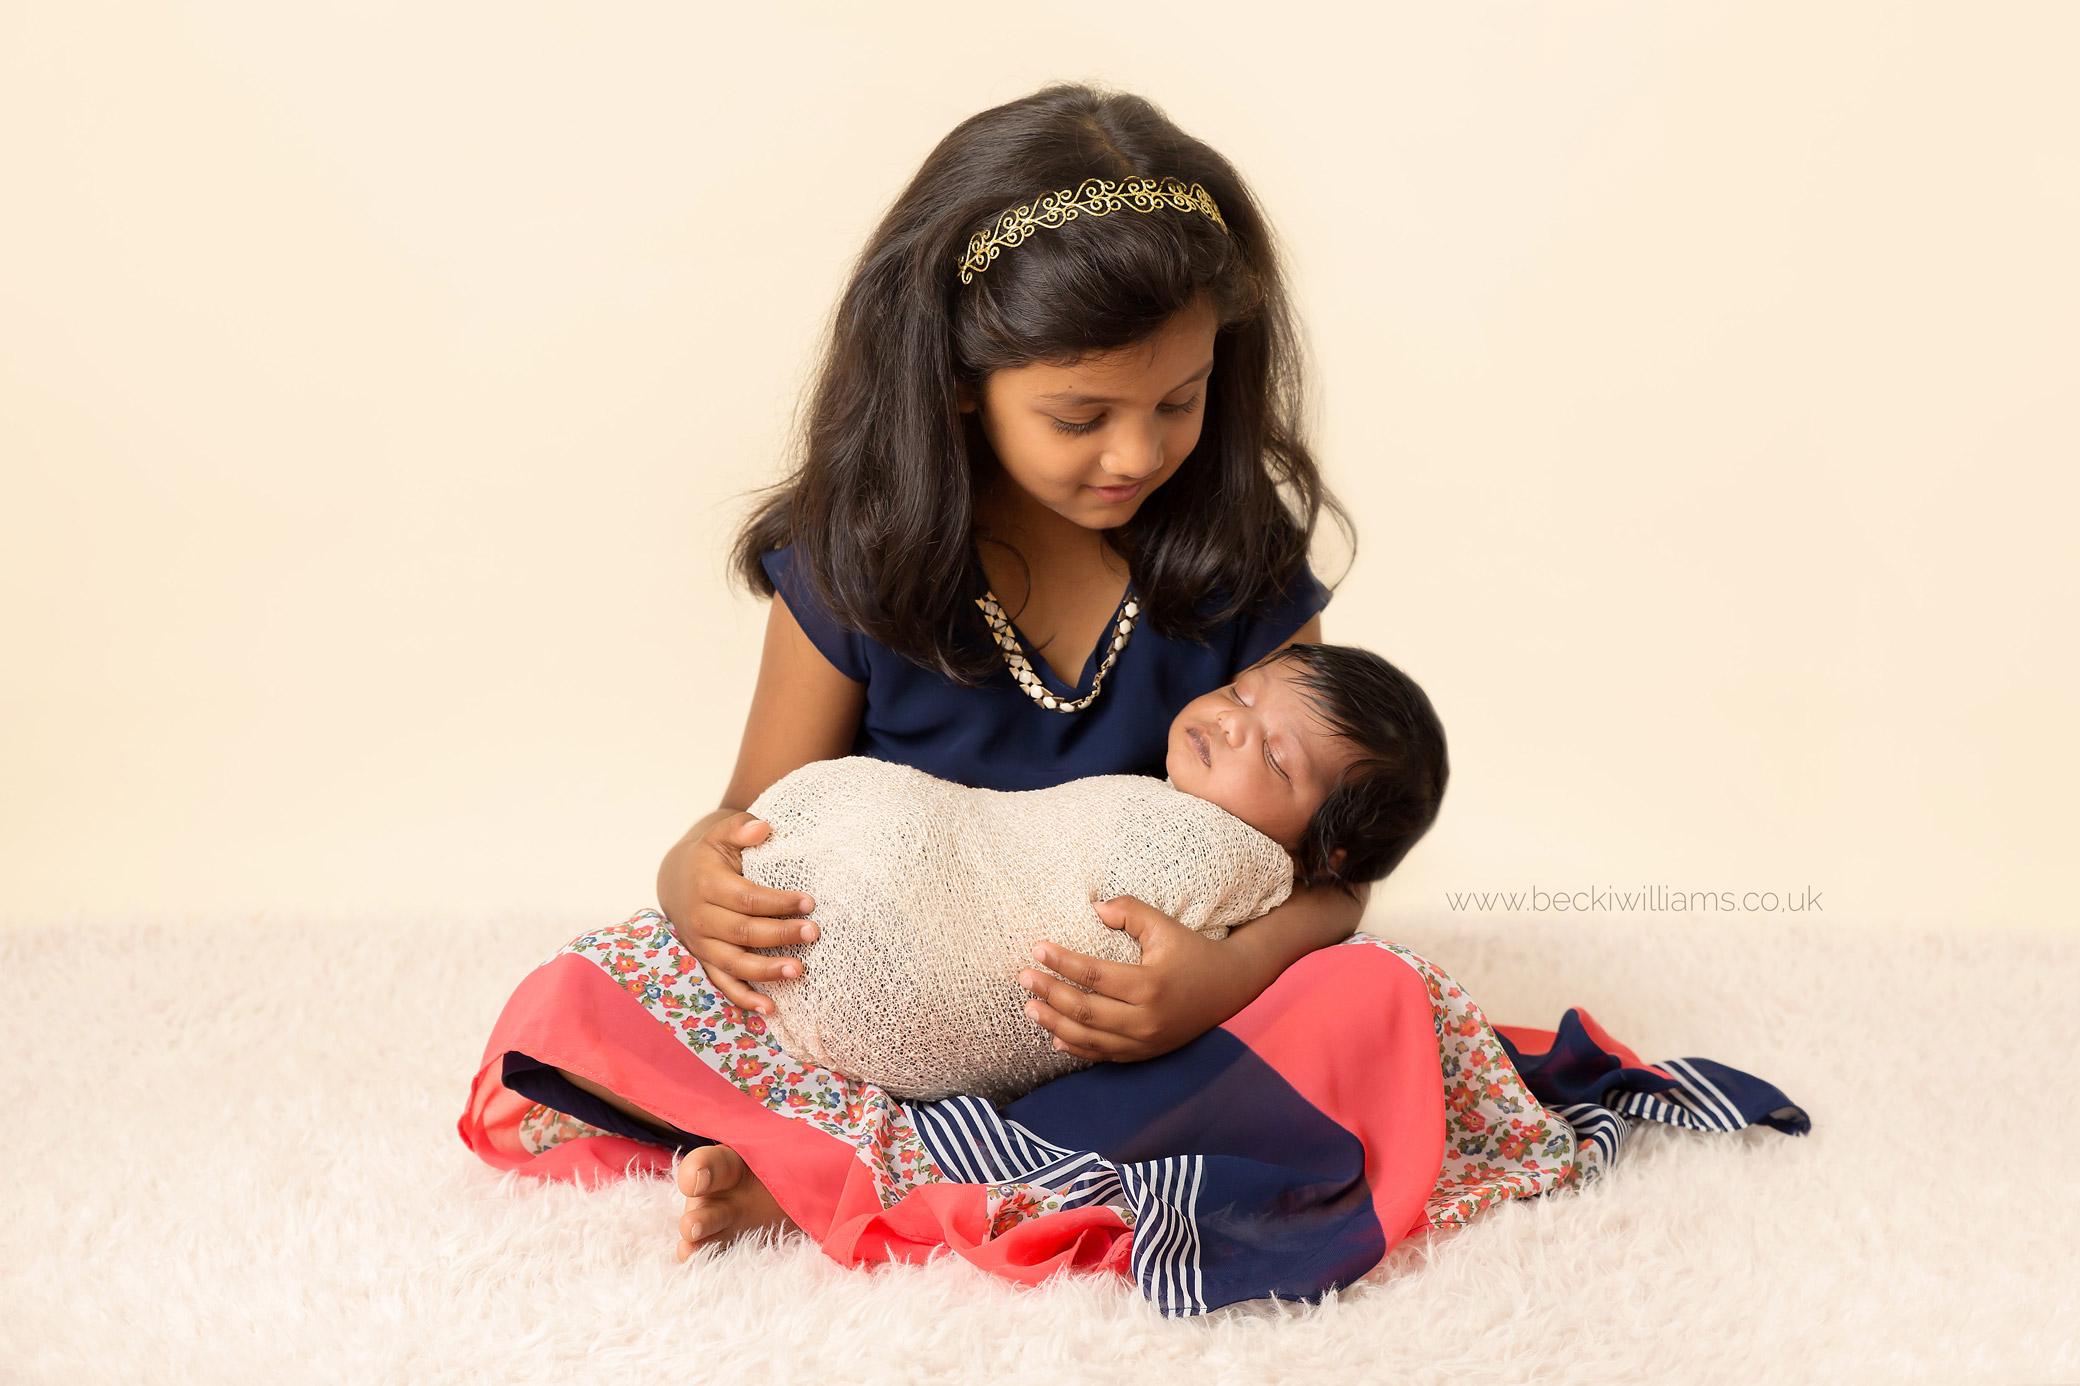 little girl holding her newborn baby sister at their newborn photo shoot in hemel hempstead